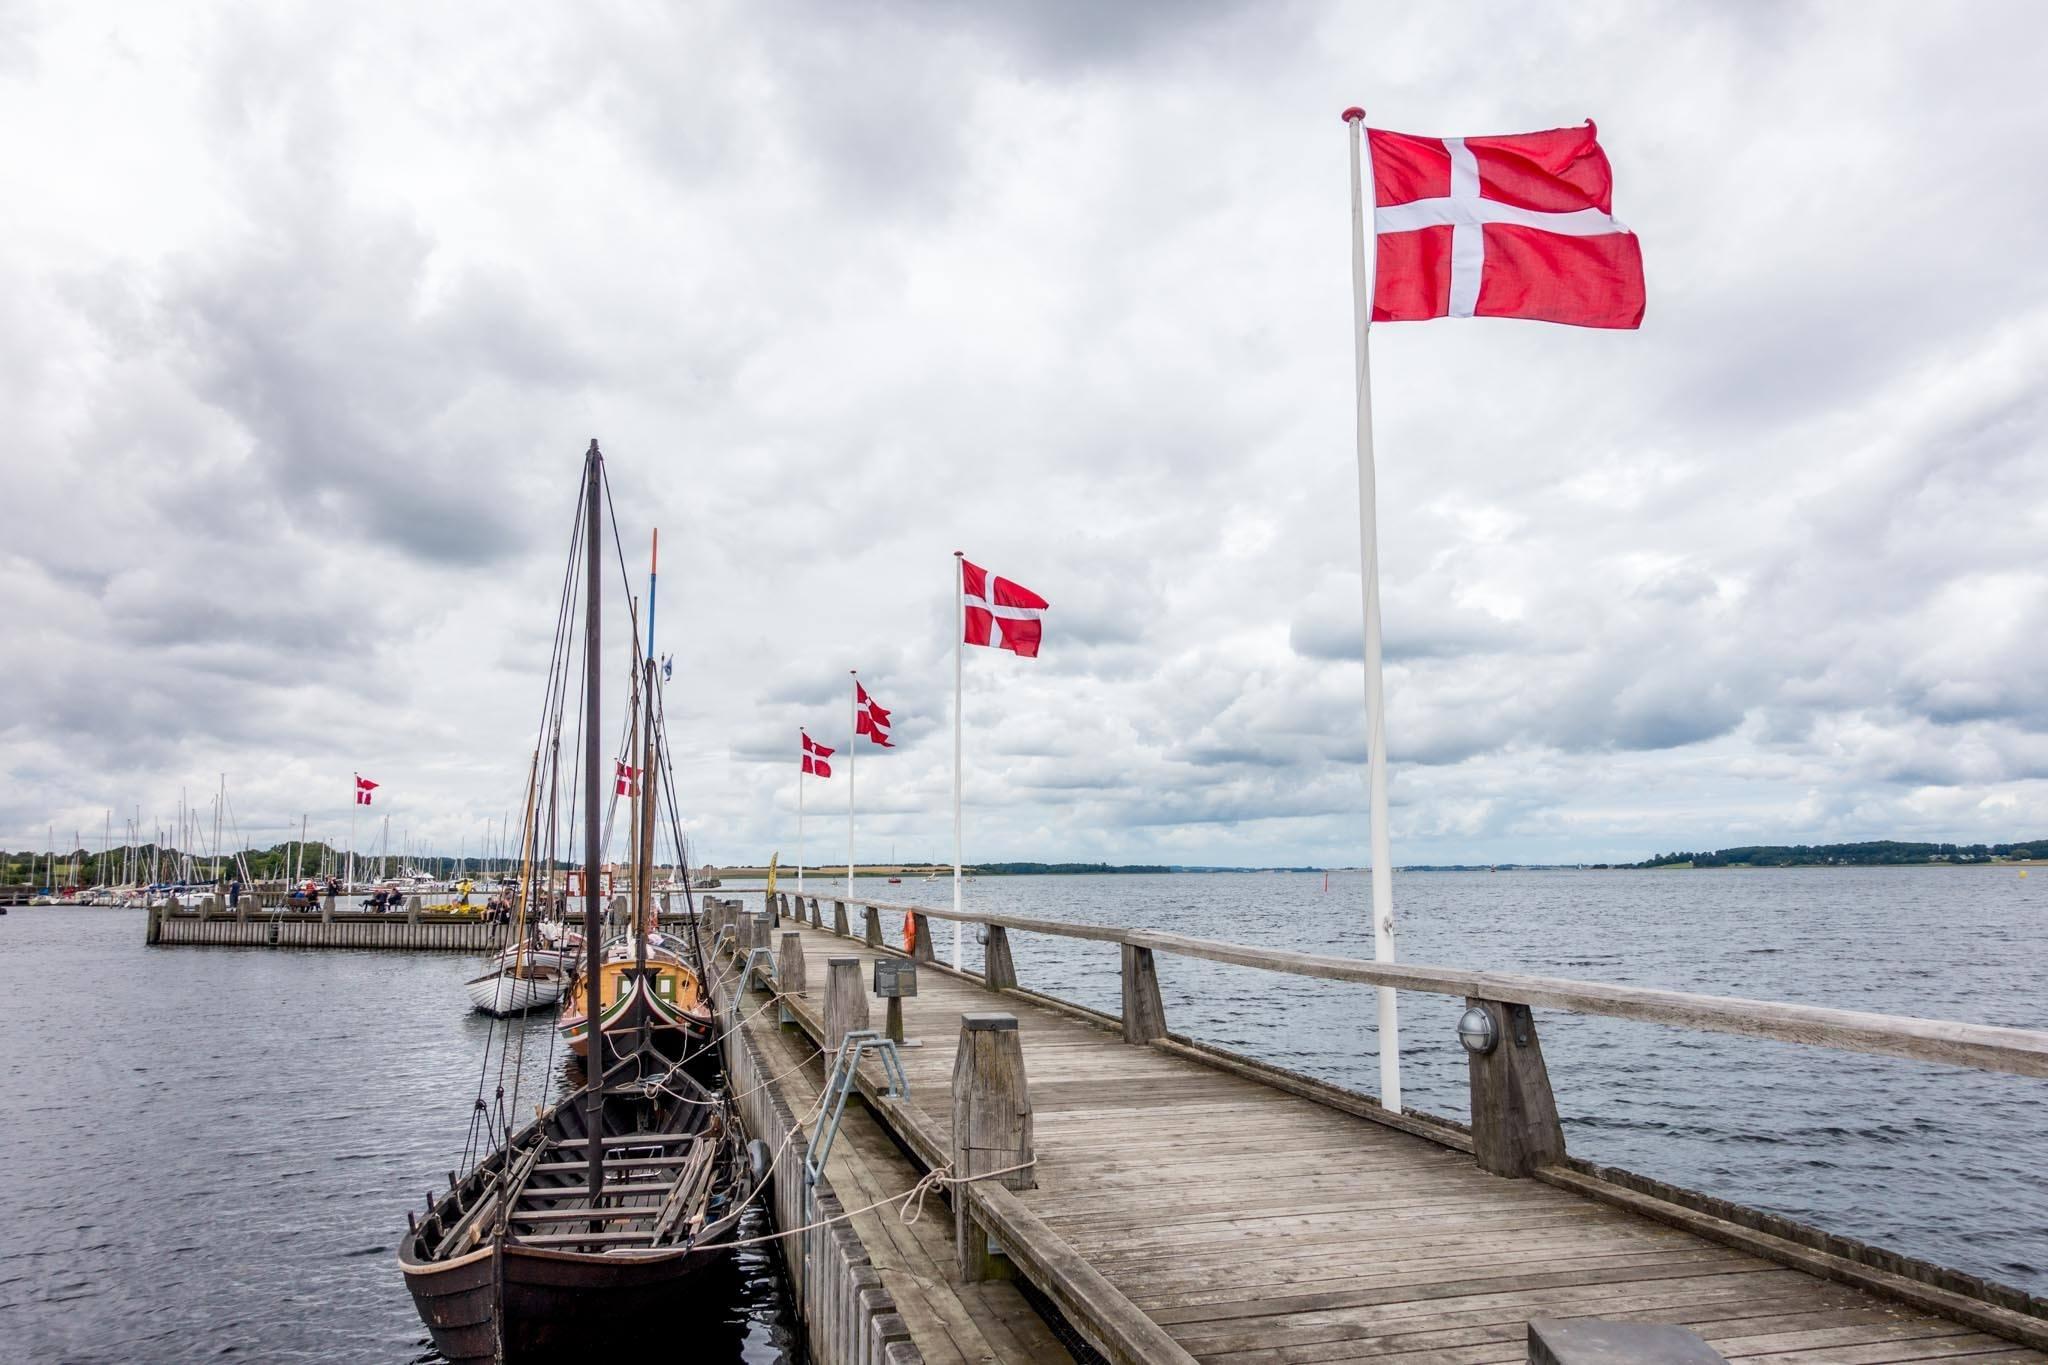 Replica ships at the Roskilde Viking Ship Museum in Denmark